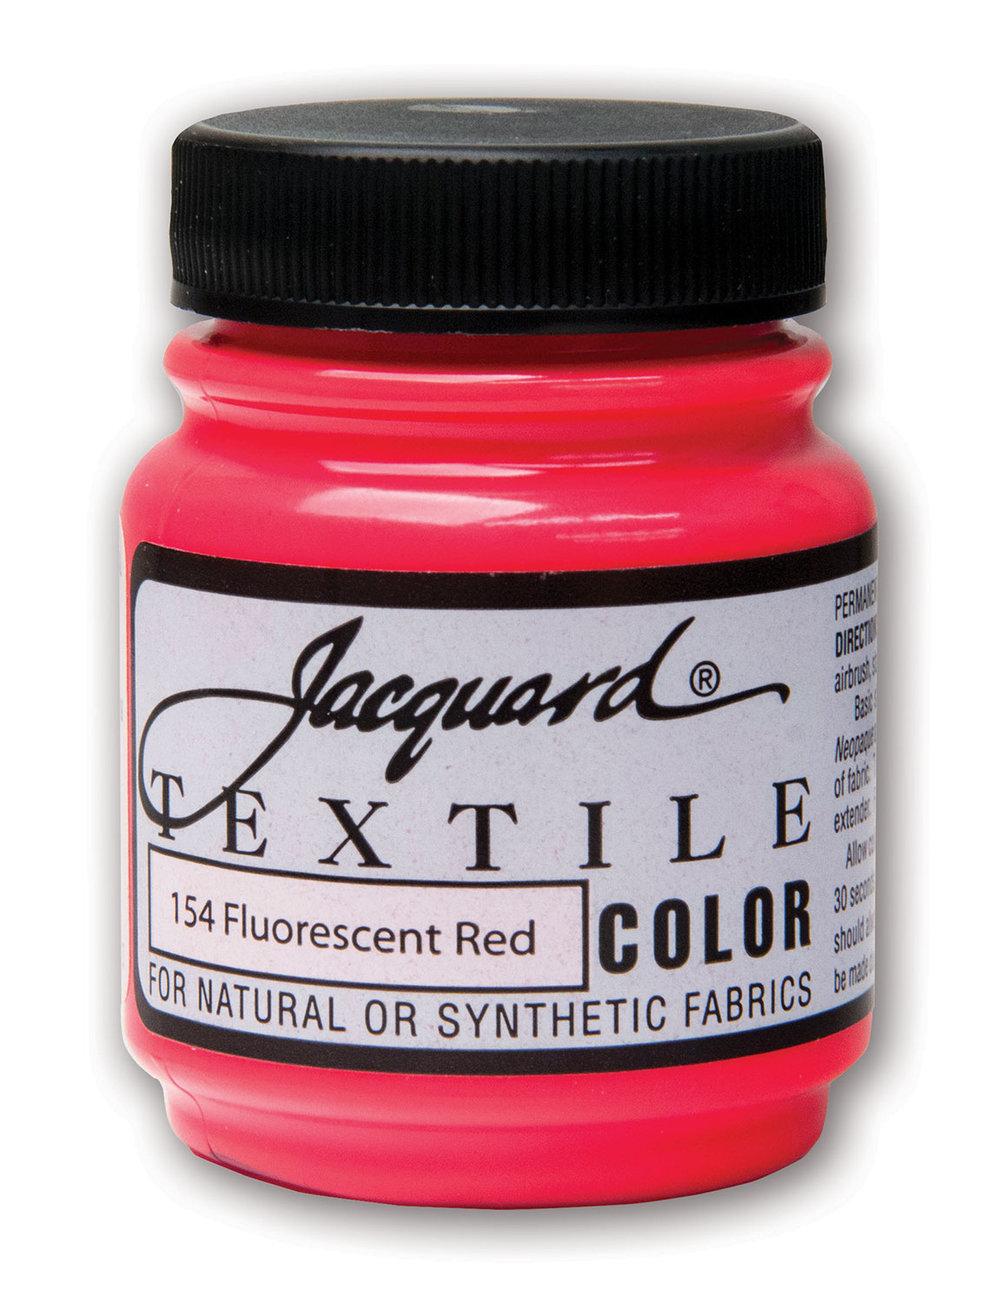 JAC1157-Textile-Color_Fluorescent-Red.jpg